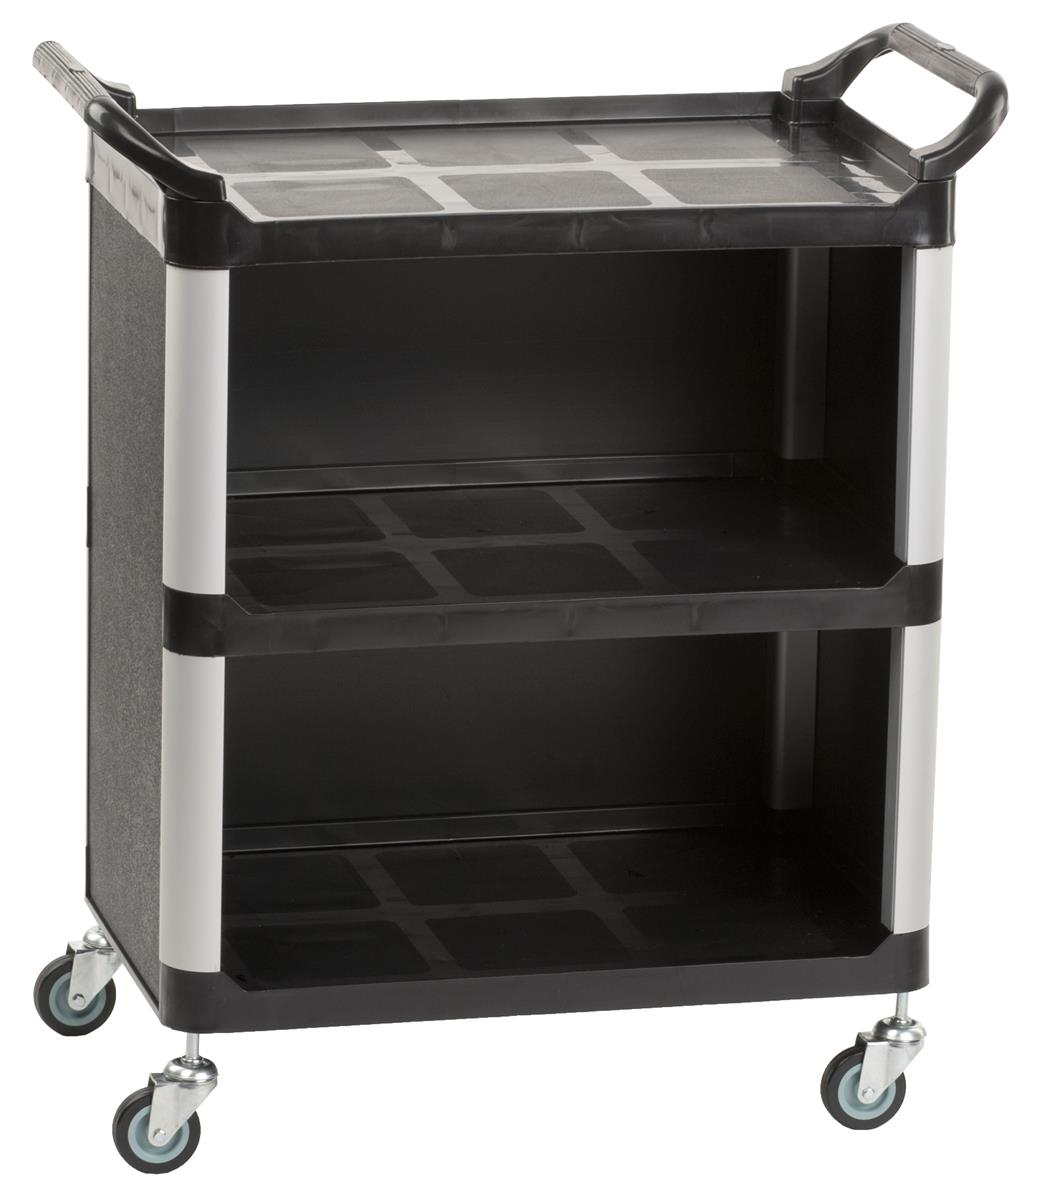 Three Shelf Utility Cart Enclosed Sides With Swivel Wheels